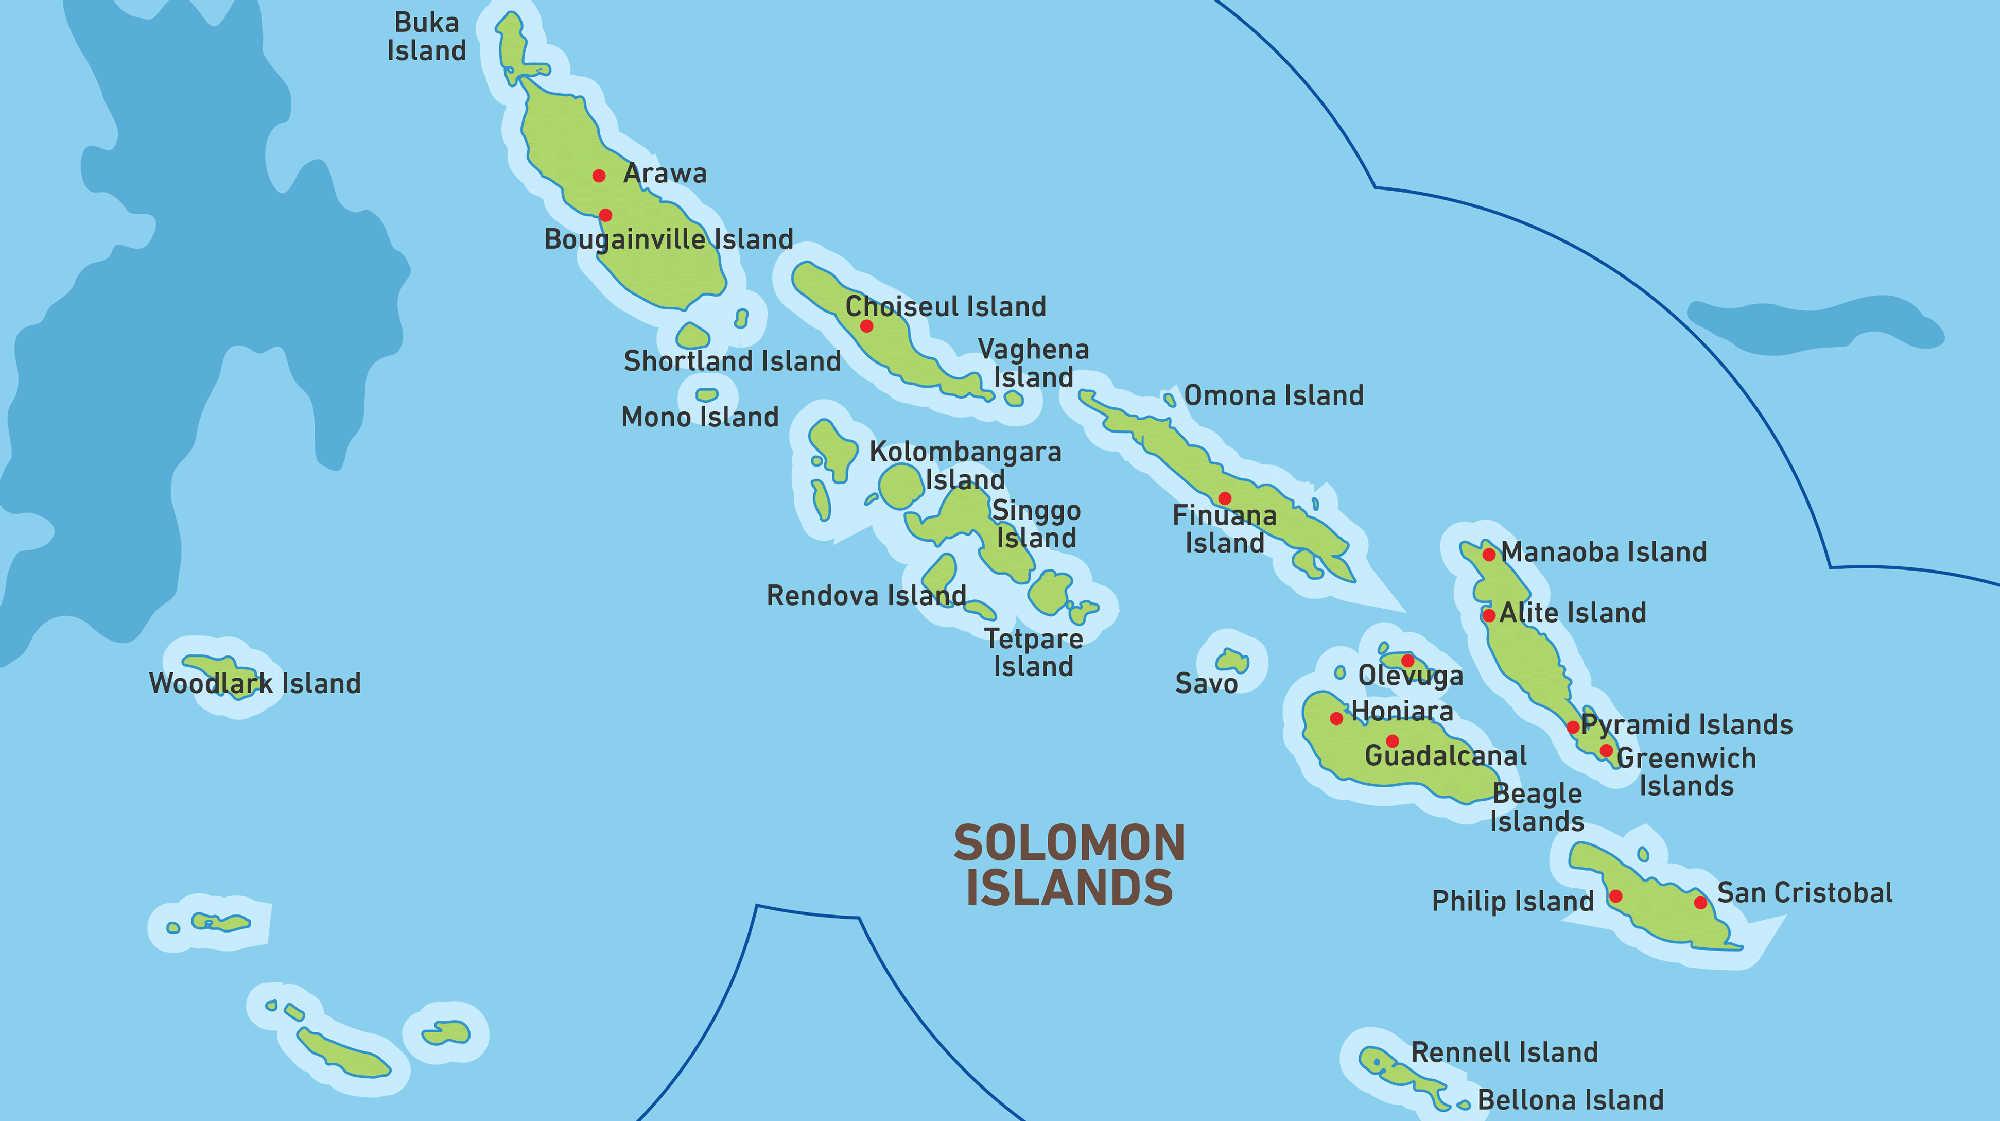 Map of Kacific 1 satellite coverage of Solomon Islands